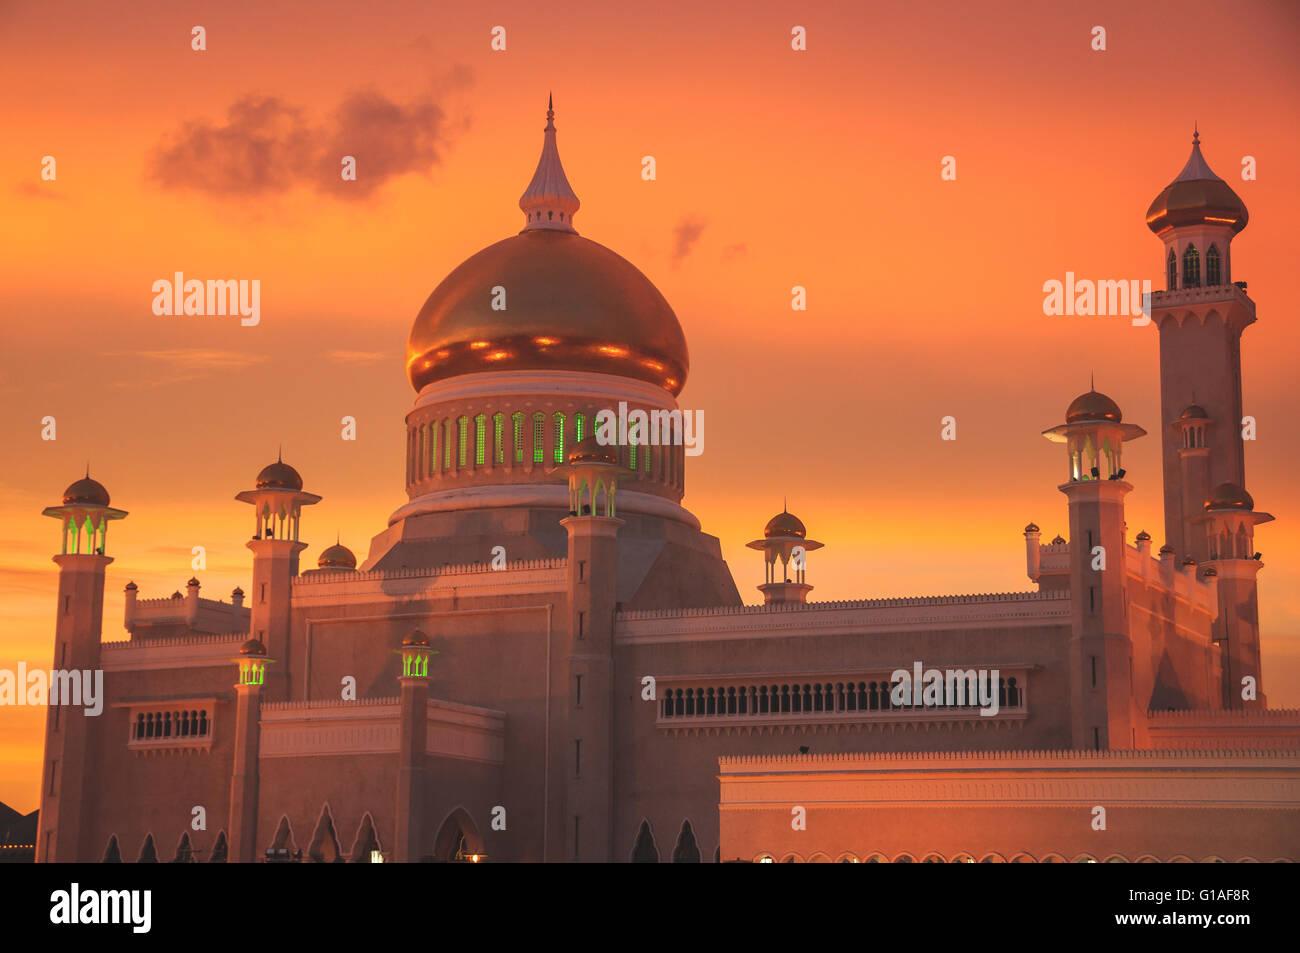 The Saifuddin mosque at sunset in Bandar Seri Bagawan, Brunei - Stock Image